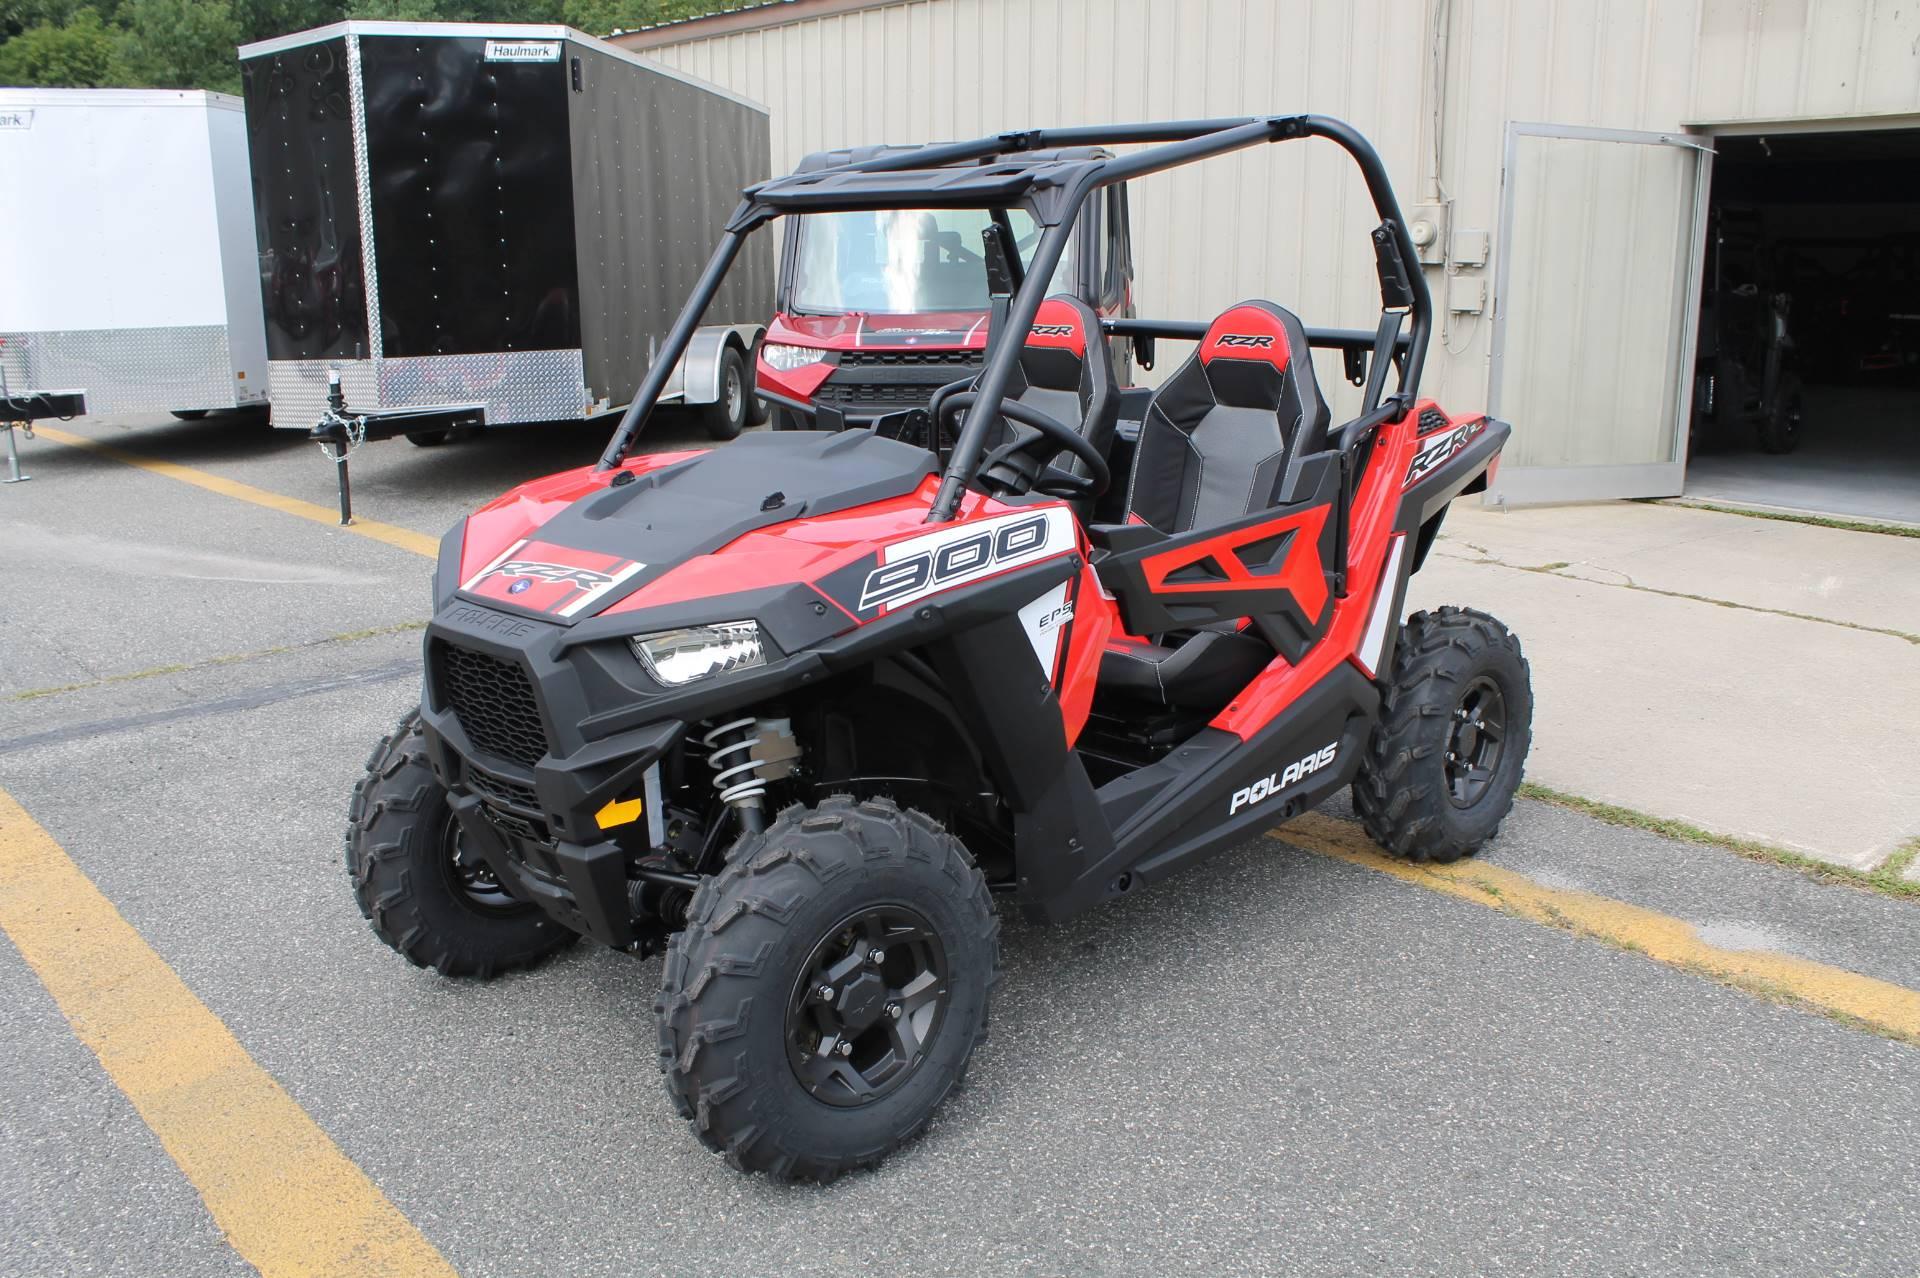 New 2019 Polaris RZR 900 EPS Utility Vehicles in Adams, MA